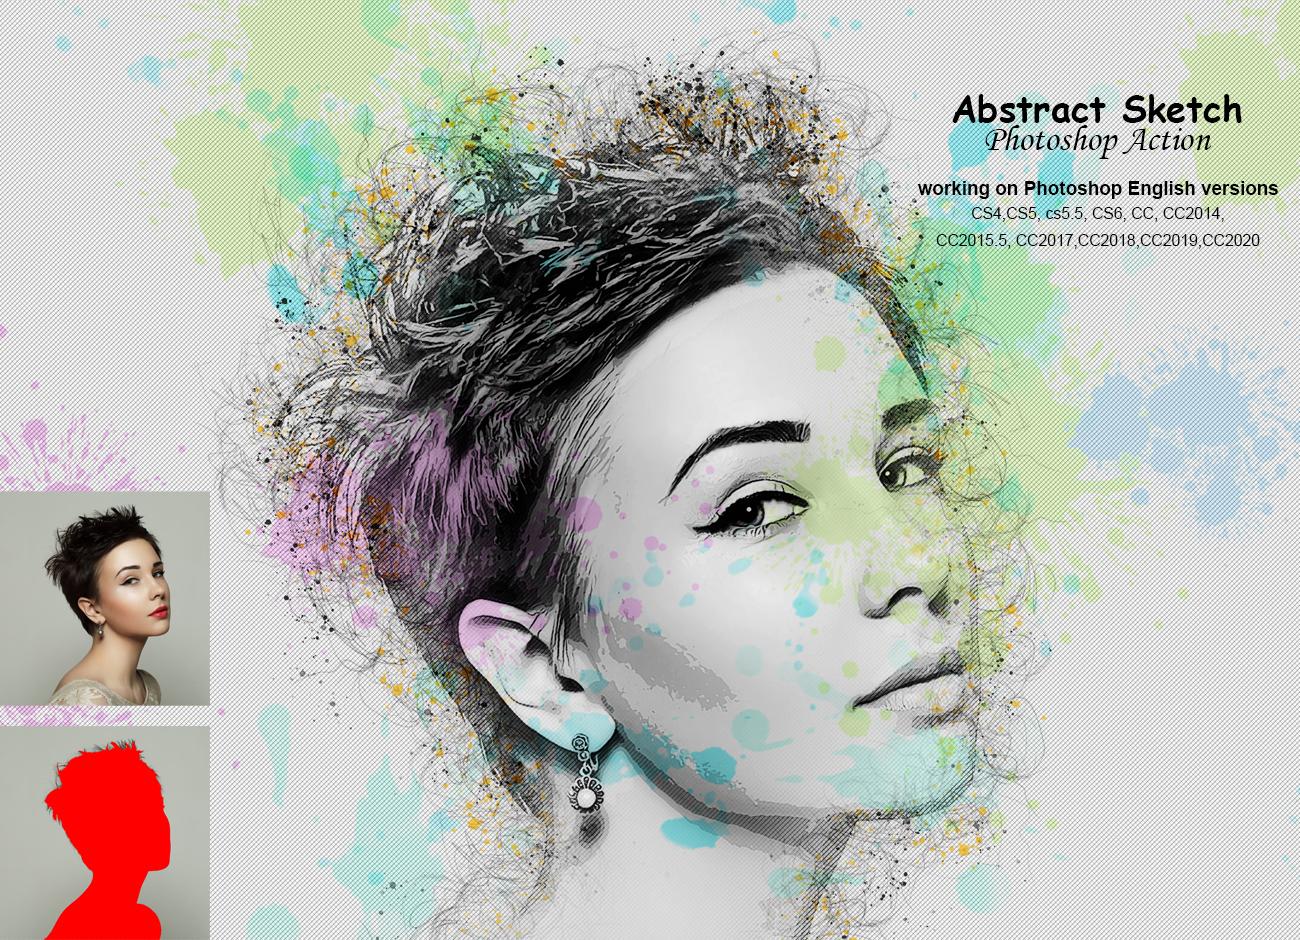 抽象铅笔素描效果照片处理特效PS动作模板 Abstract Sketch Photoshop Action插图